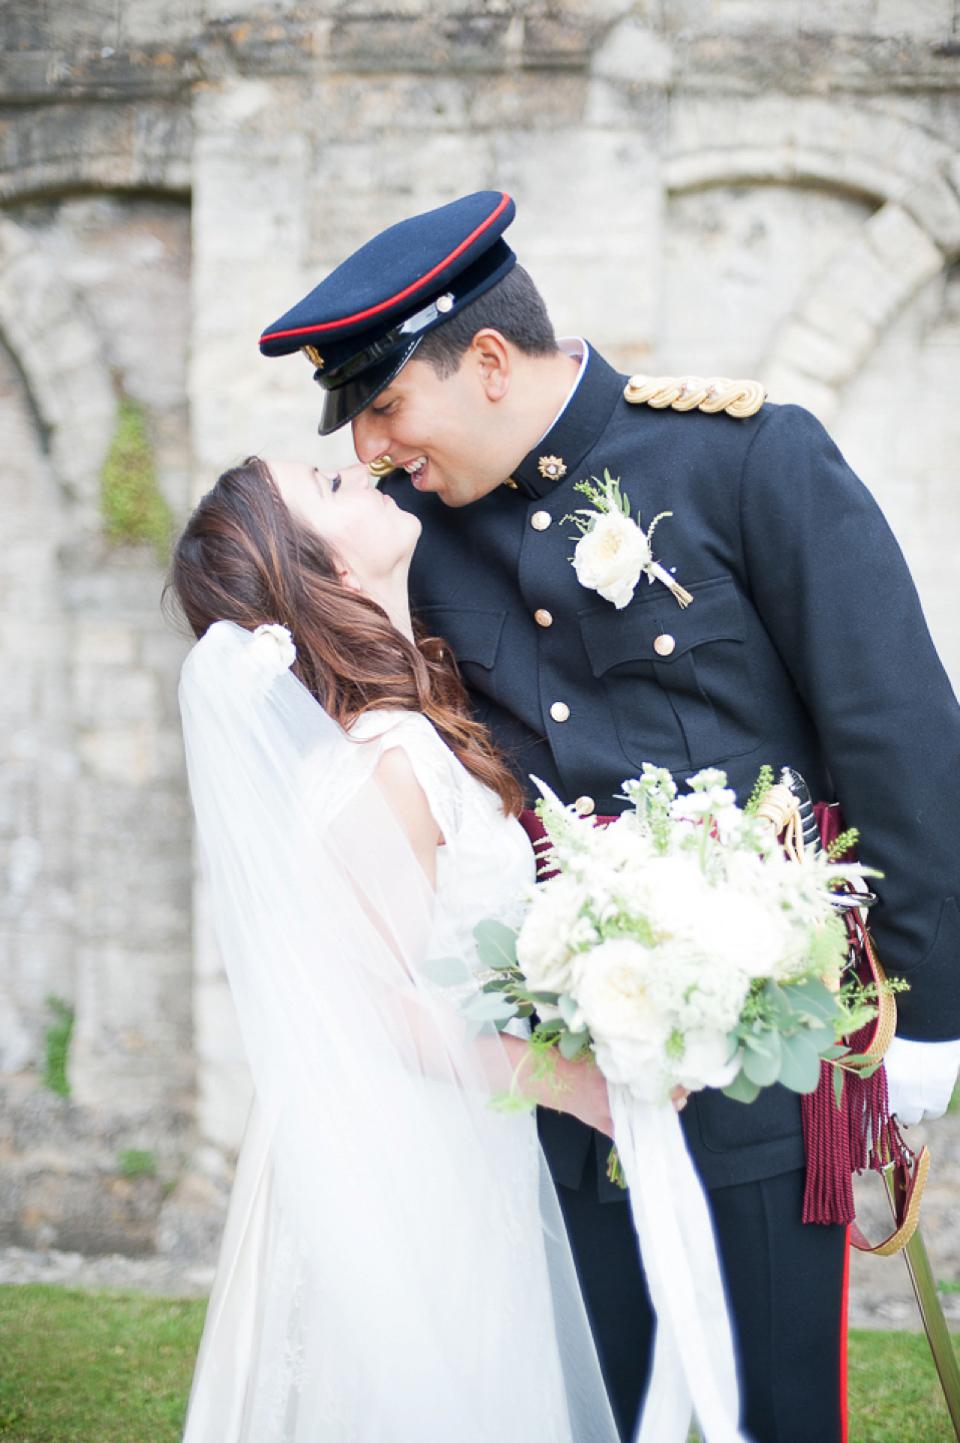 Wpid Military Wedding Charlie Brear A Gown For An Elegant